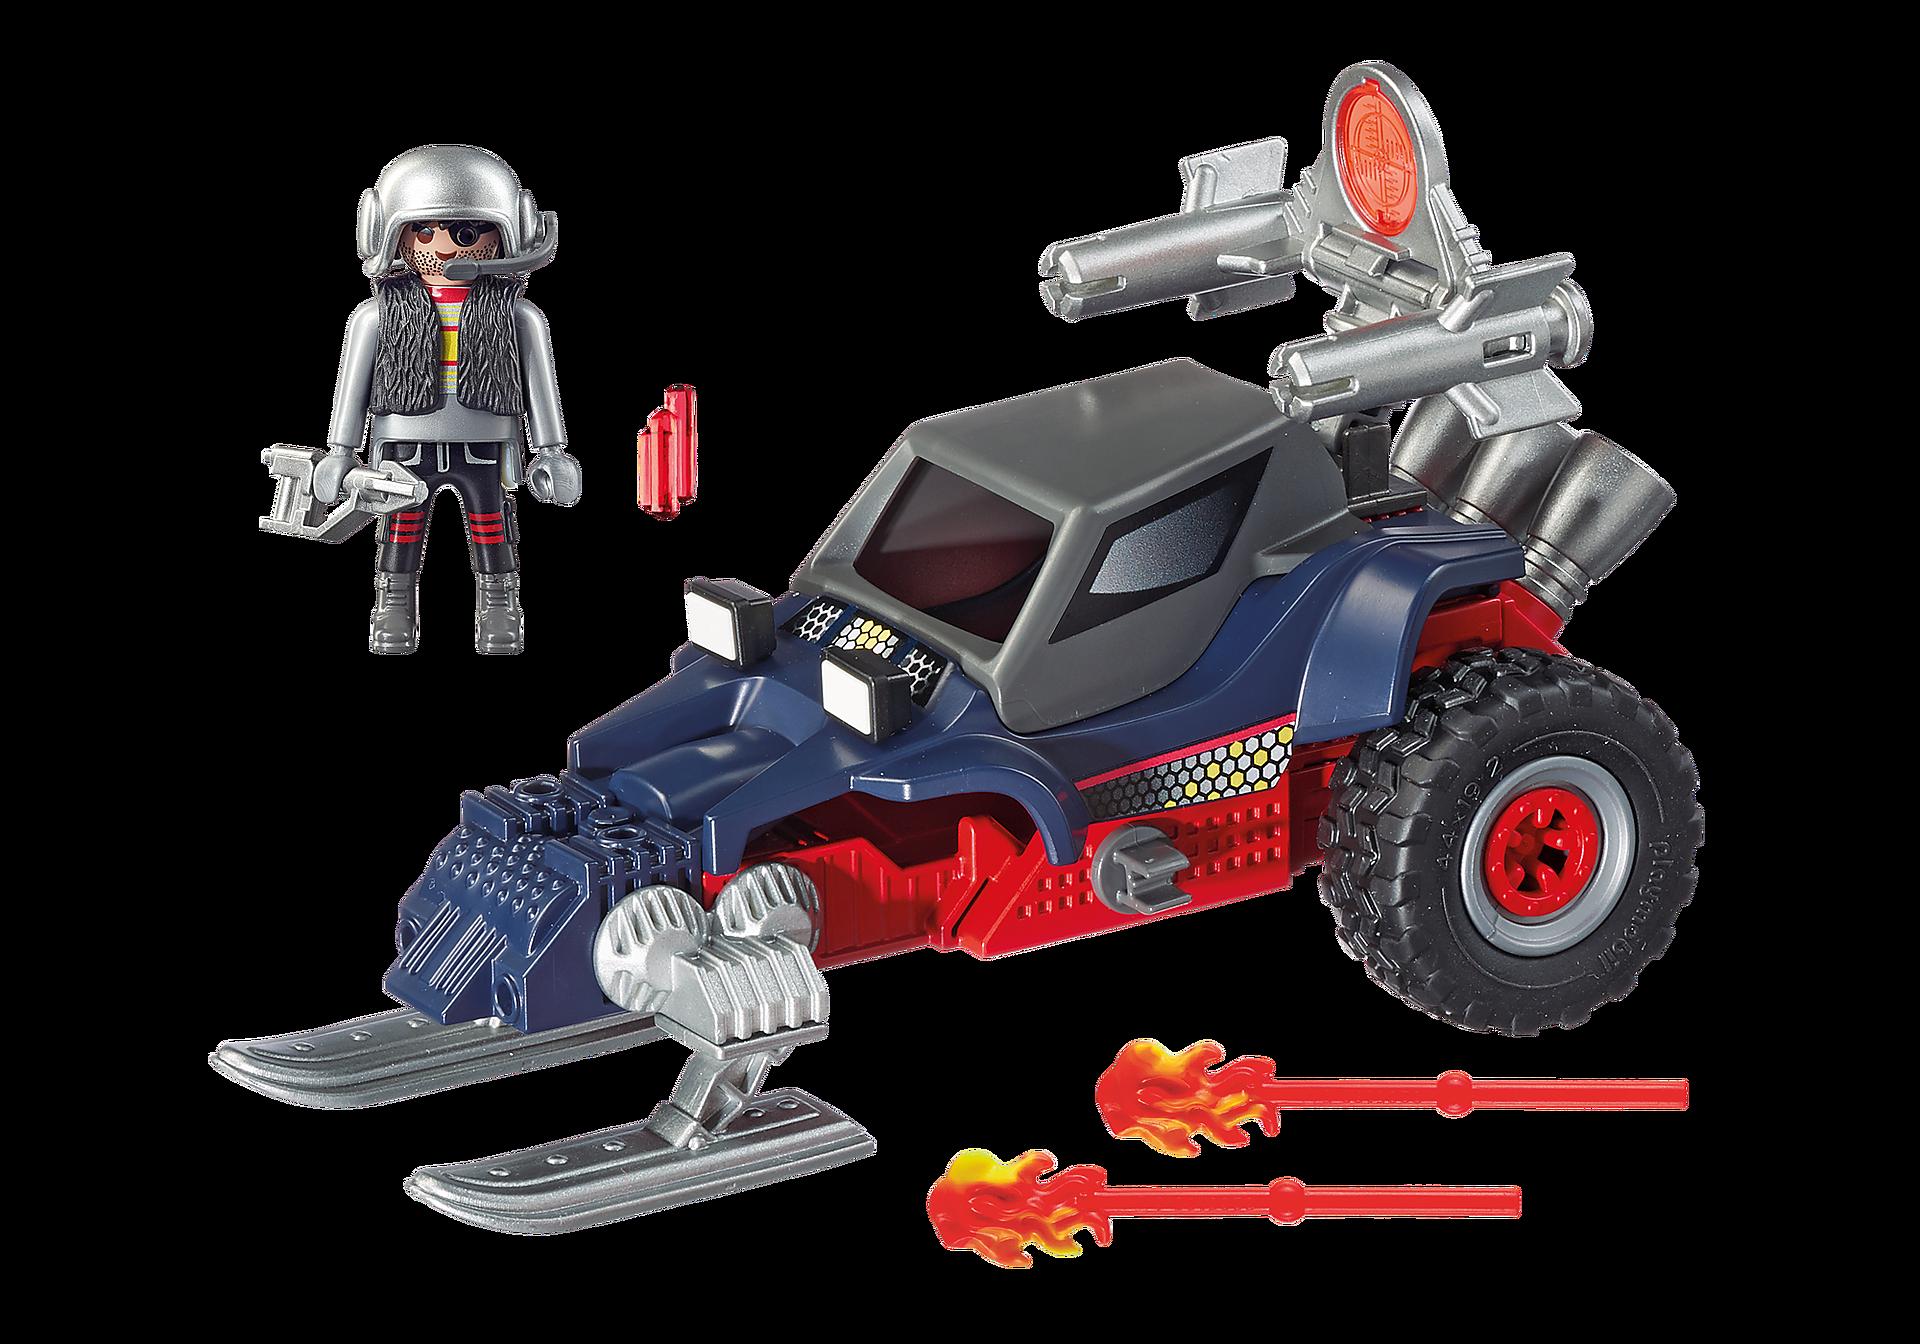 http://media.playmobil.com/i/playmobil/9058_product_box_back/Sneeuwscooter met ijspiraat